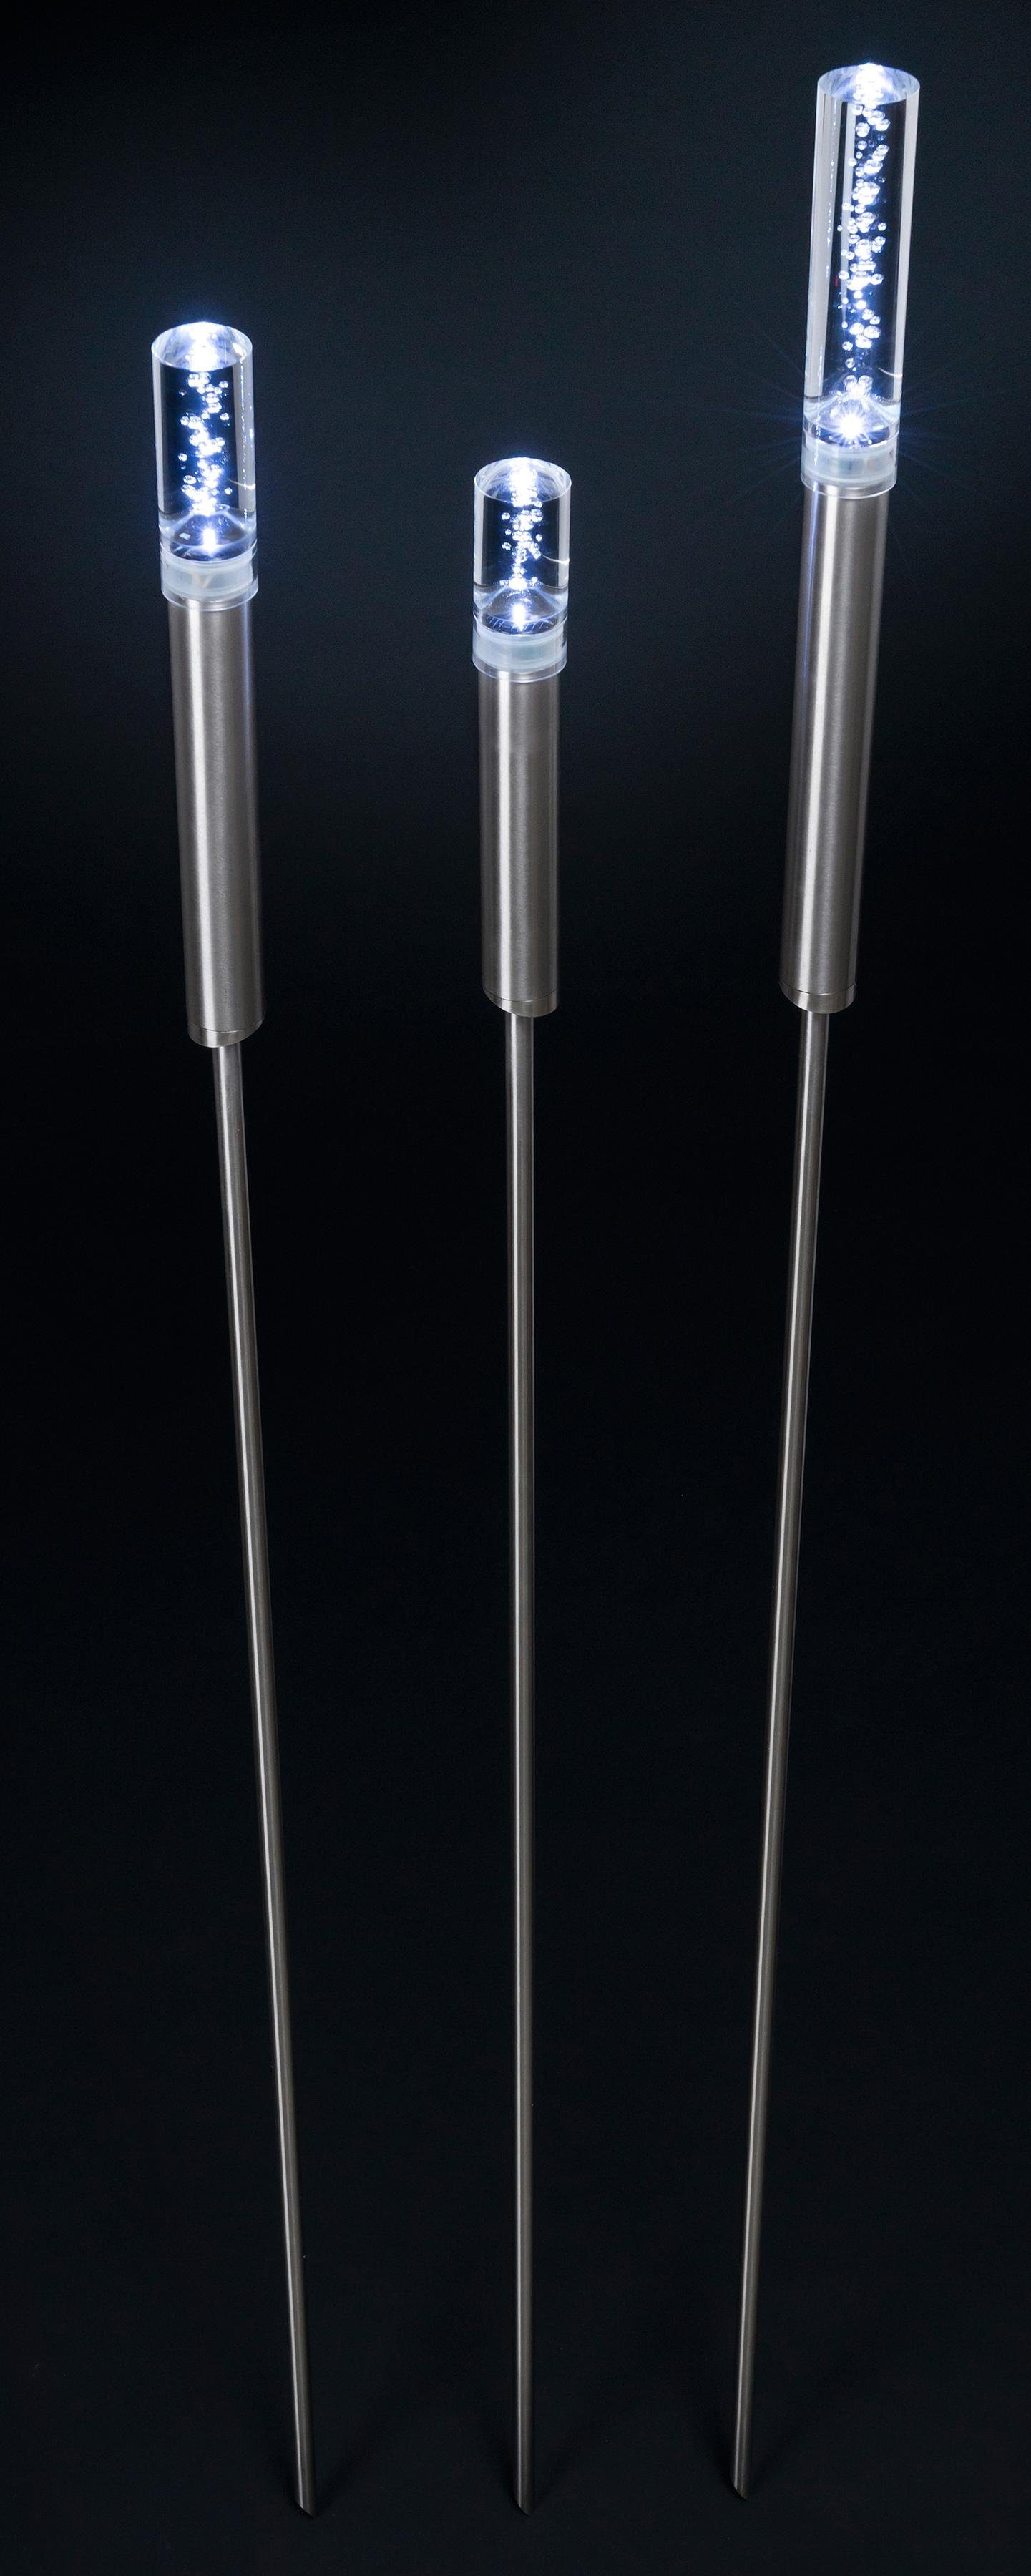 LED Gartenleuchte »SINPASY«, 3-flammig, Edelstahl V2A geschliffen